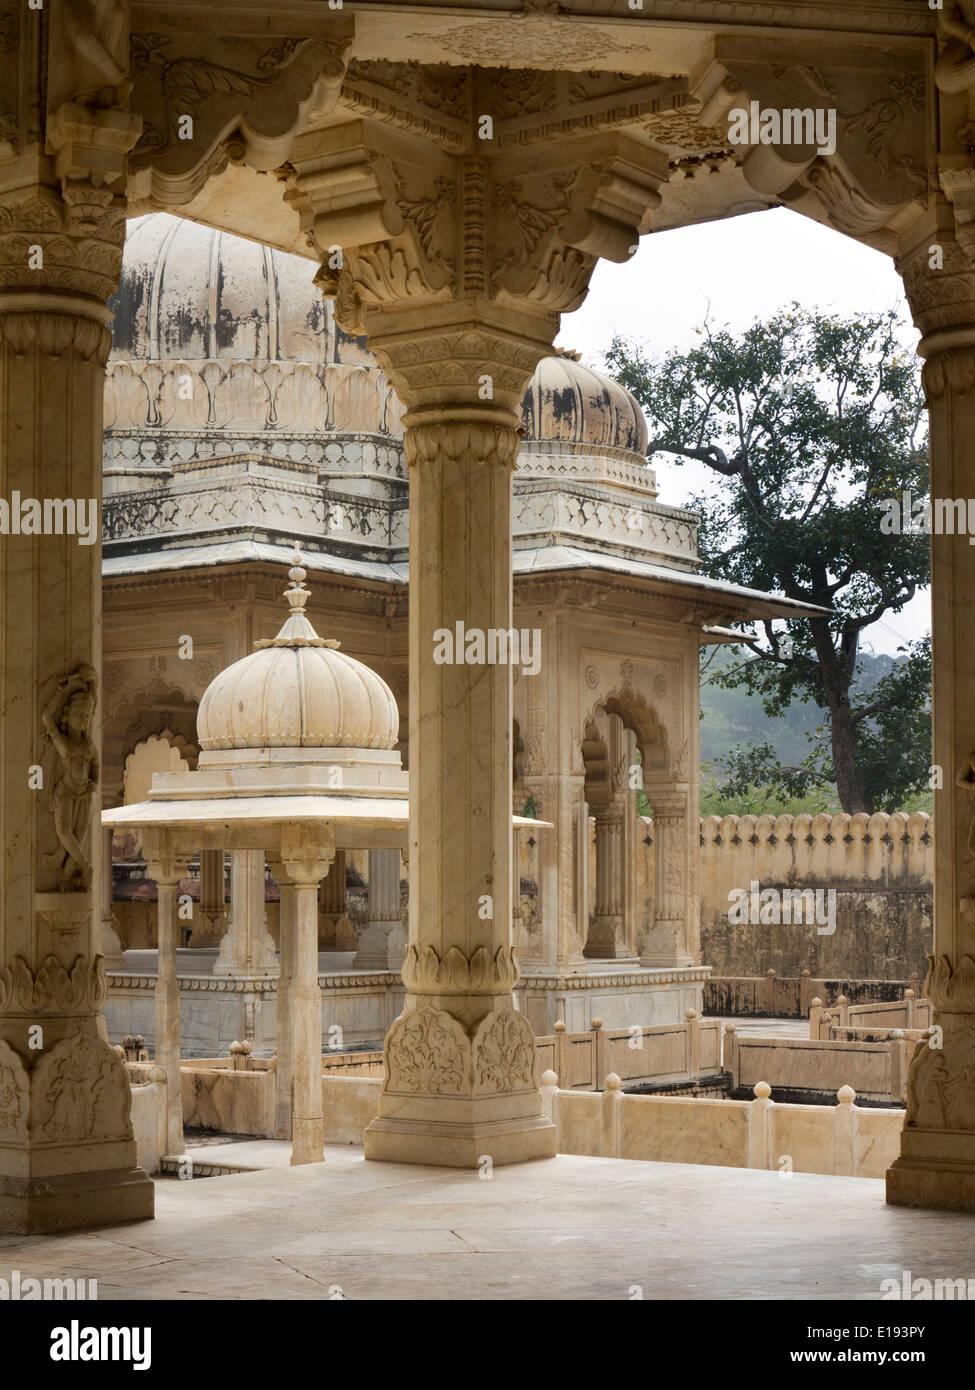 India, Rajasthan, Jaipur, Gaitore Ki Chhatriyan, Royal Cremation Ground, marble cenotaphs - Stock Image